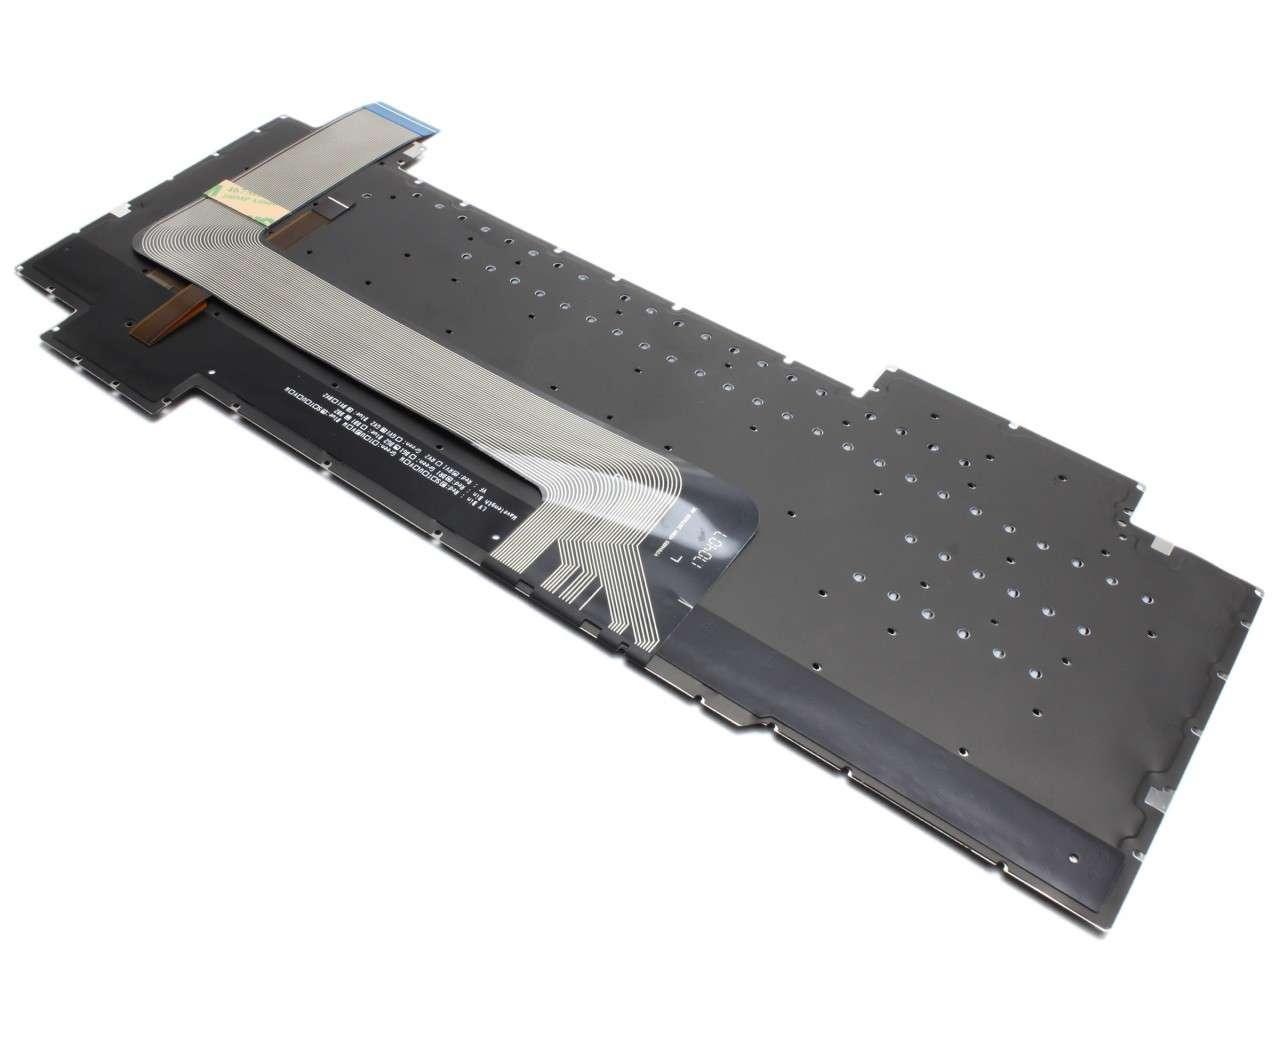 Tastatura Asus Asus ROG Strix GL703VD iluminata layout US fara rama enter mic imagine